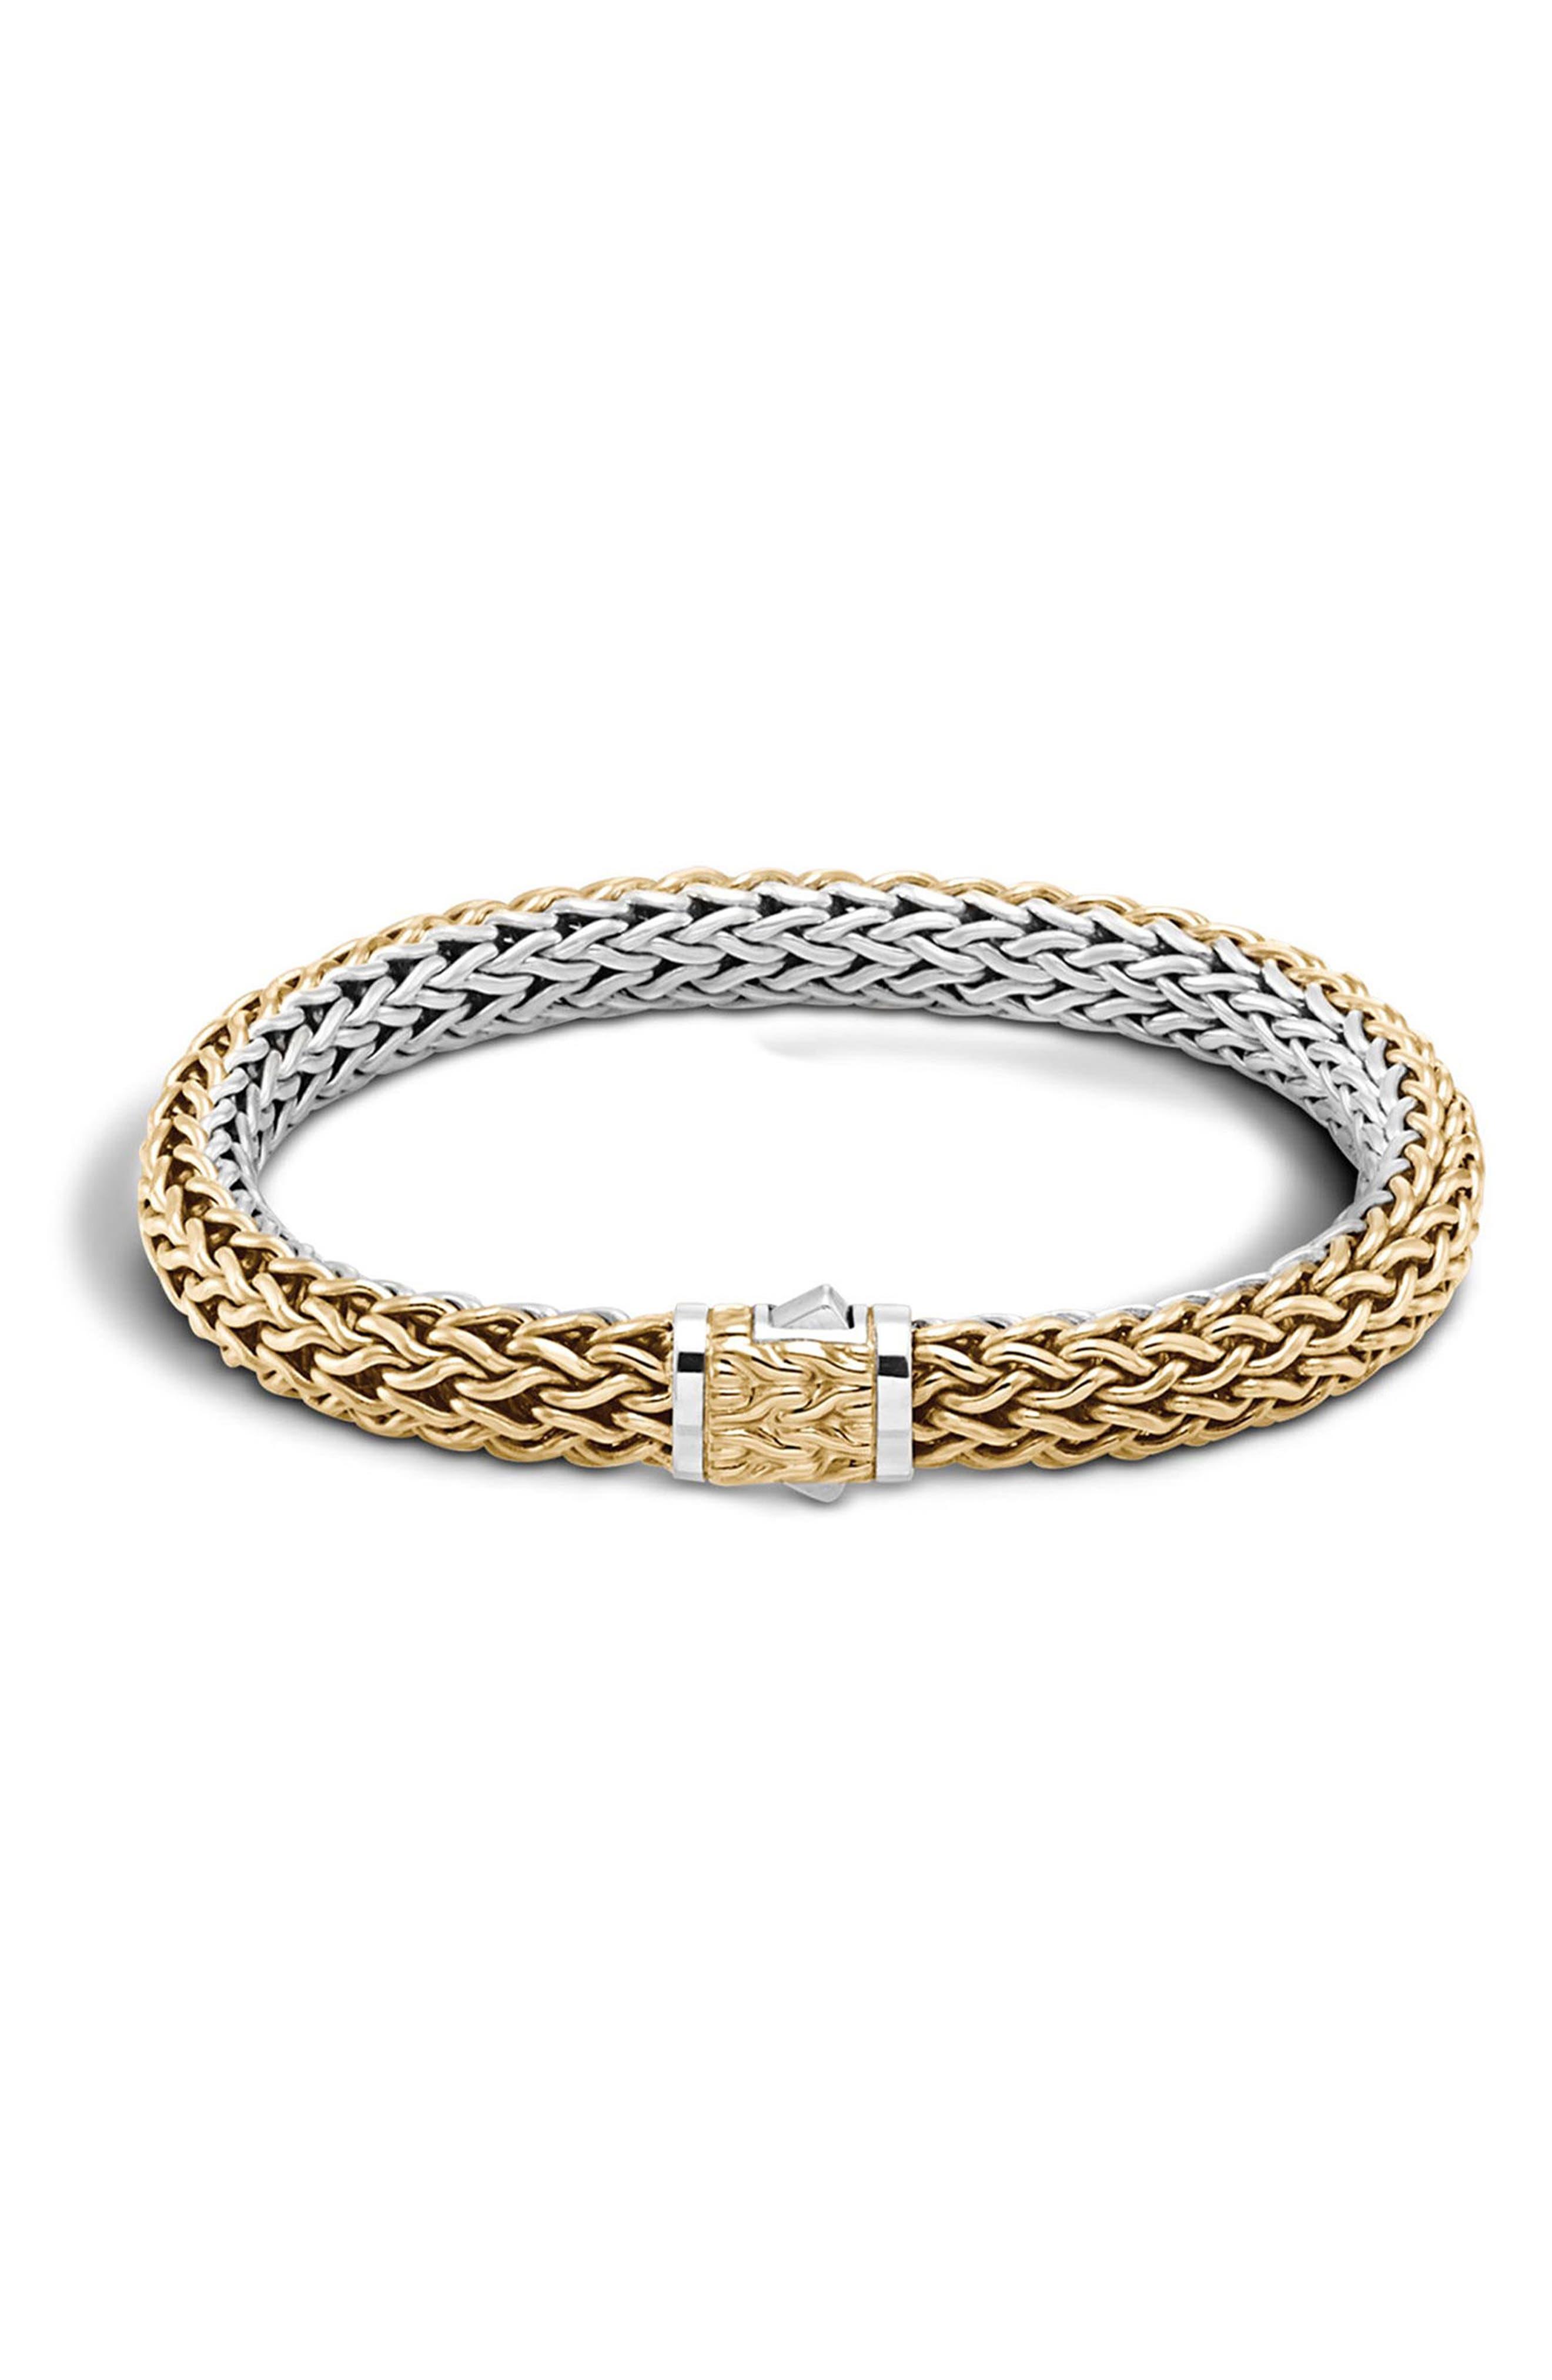 Reversible Classic Chain Bracelet,                             Main thumbnail 1, color,                             SILVER/ GOLD